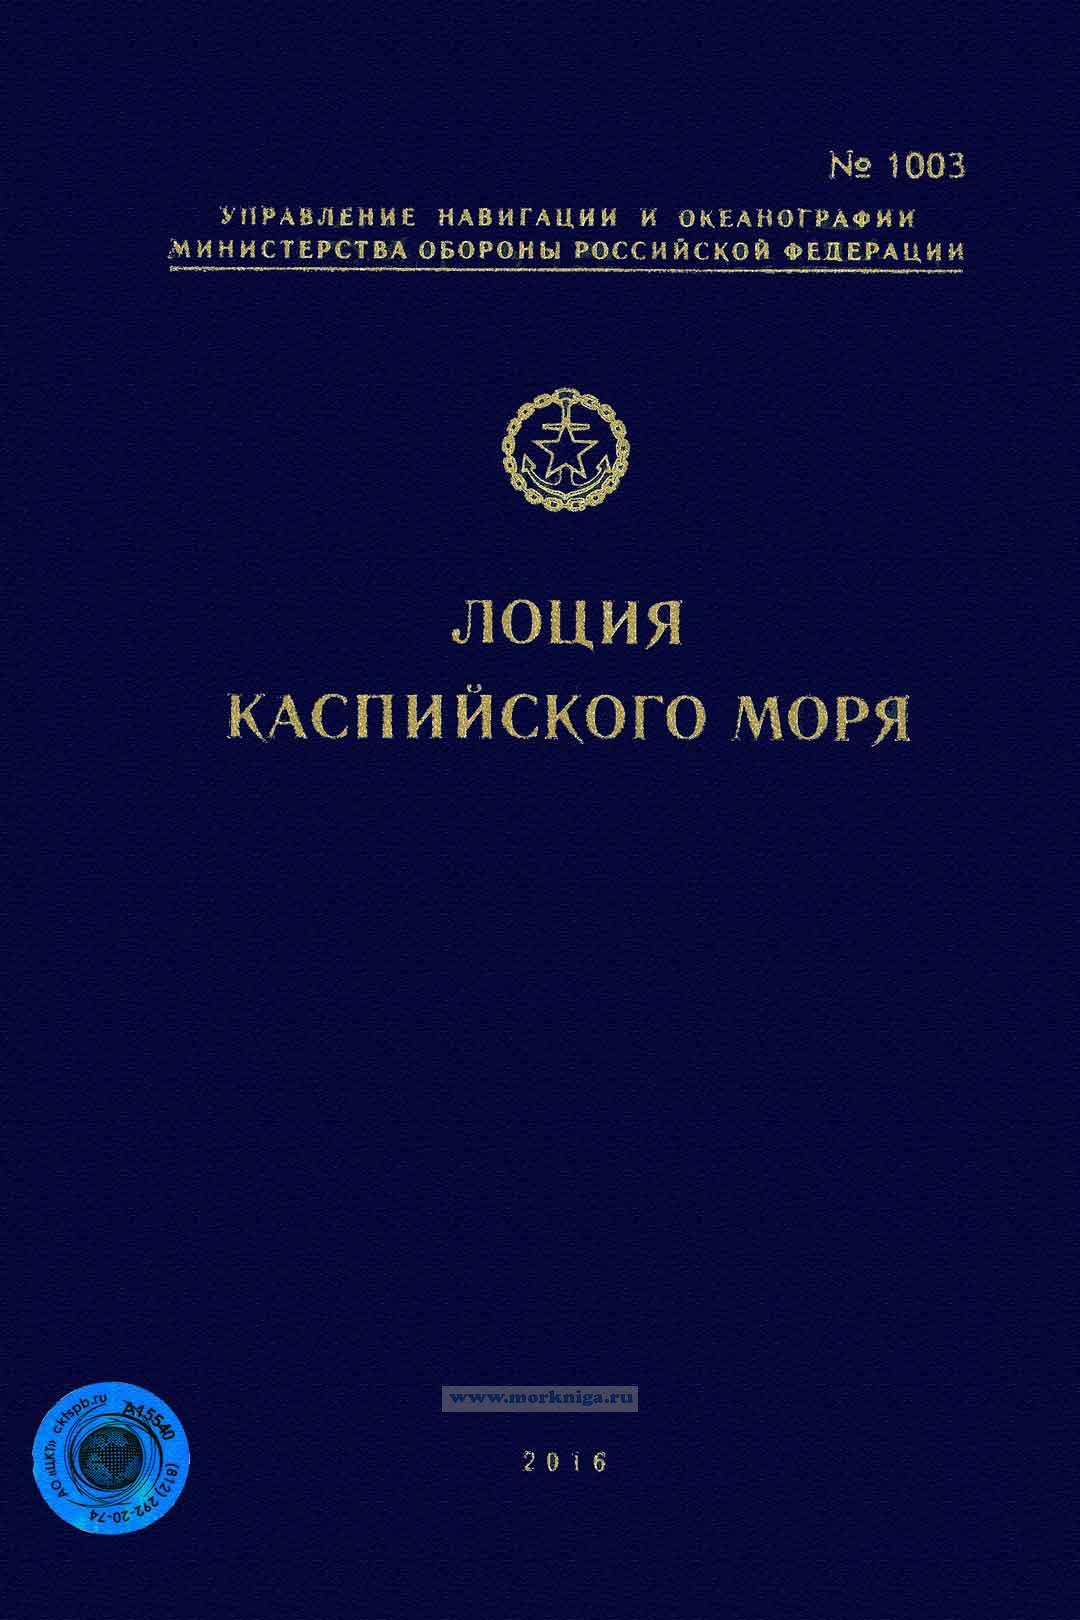 Лоция Каспийского моря. Адм. № 1003